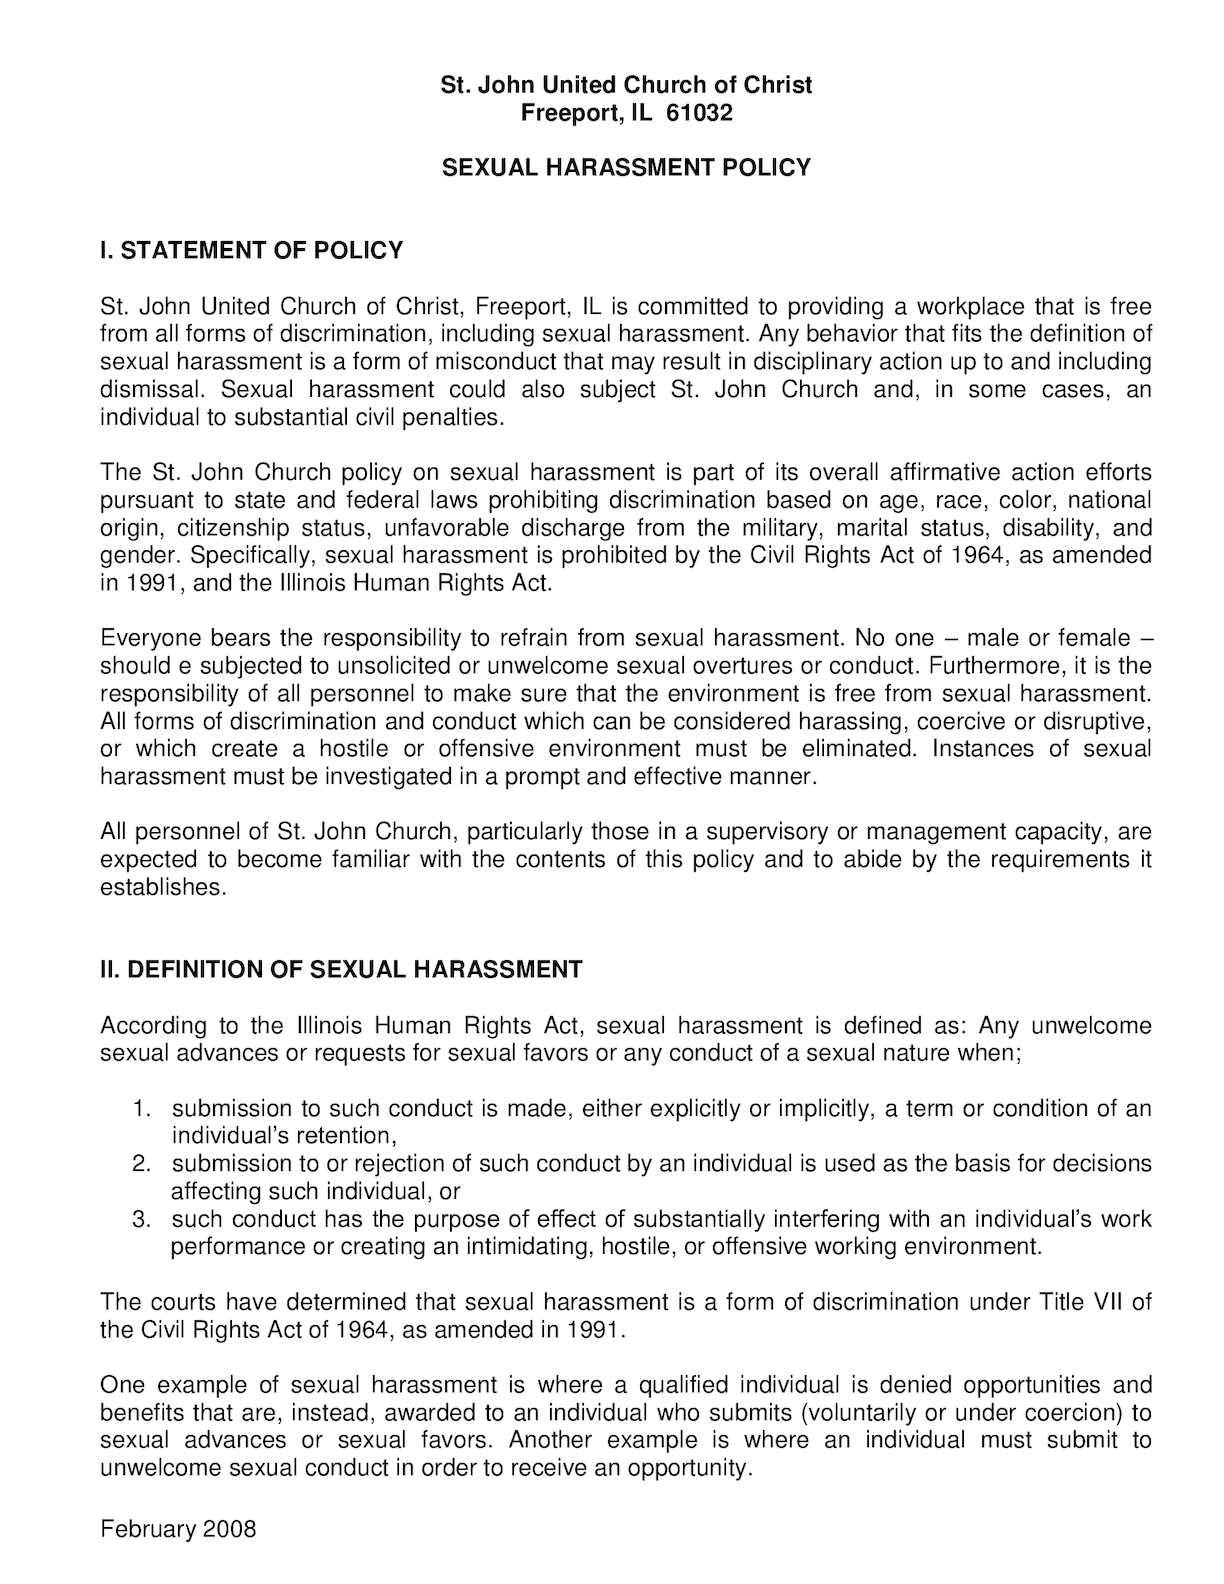 Policies regarding sexual harassment